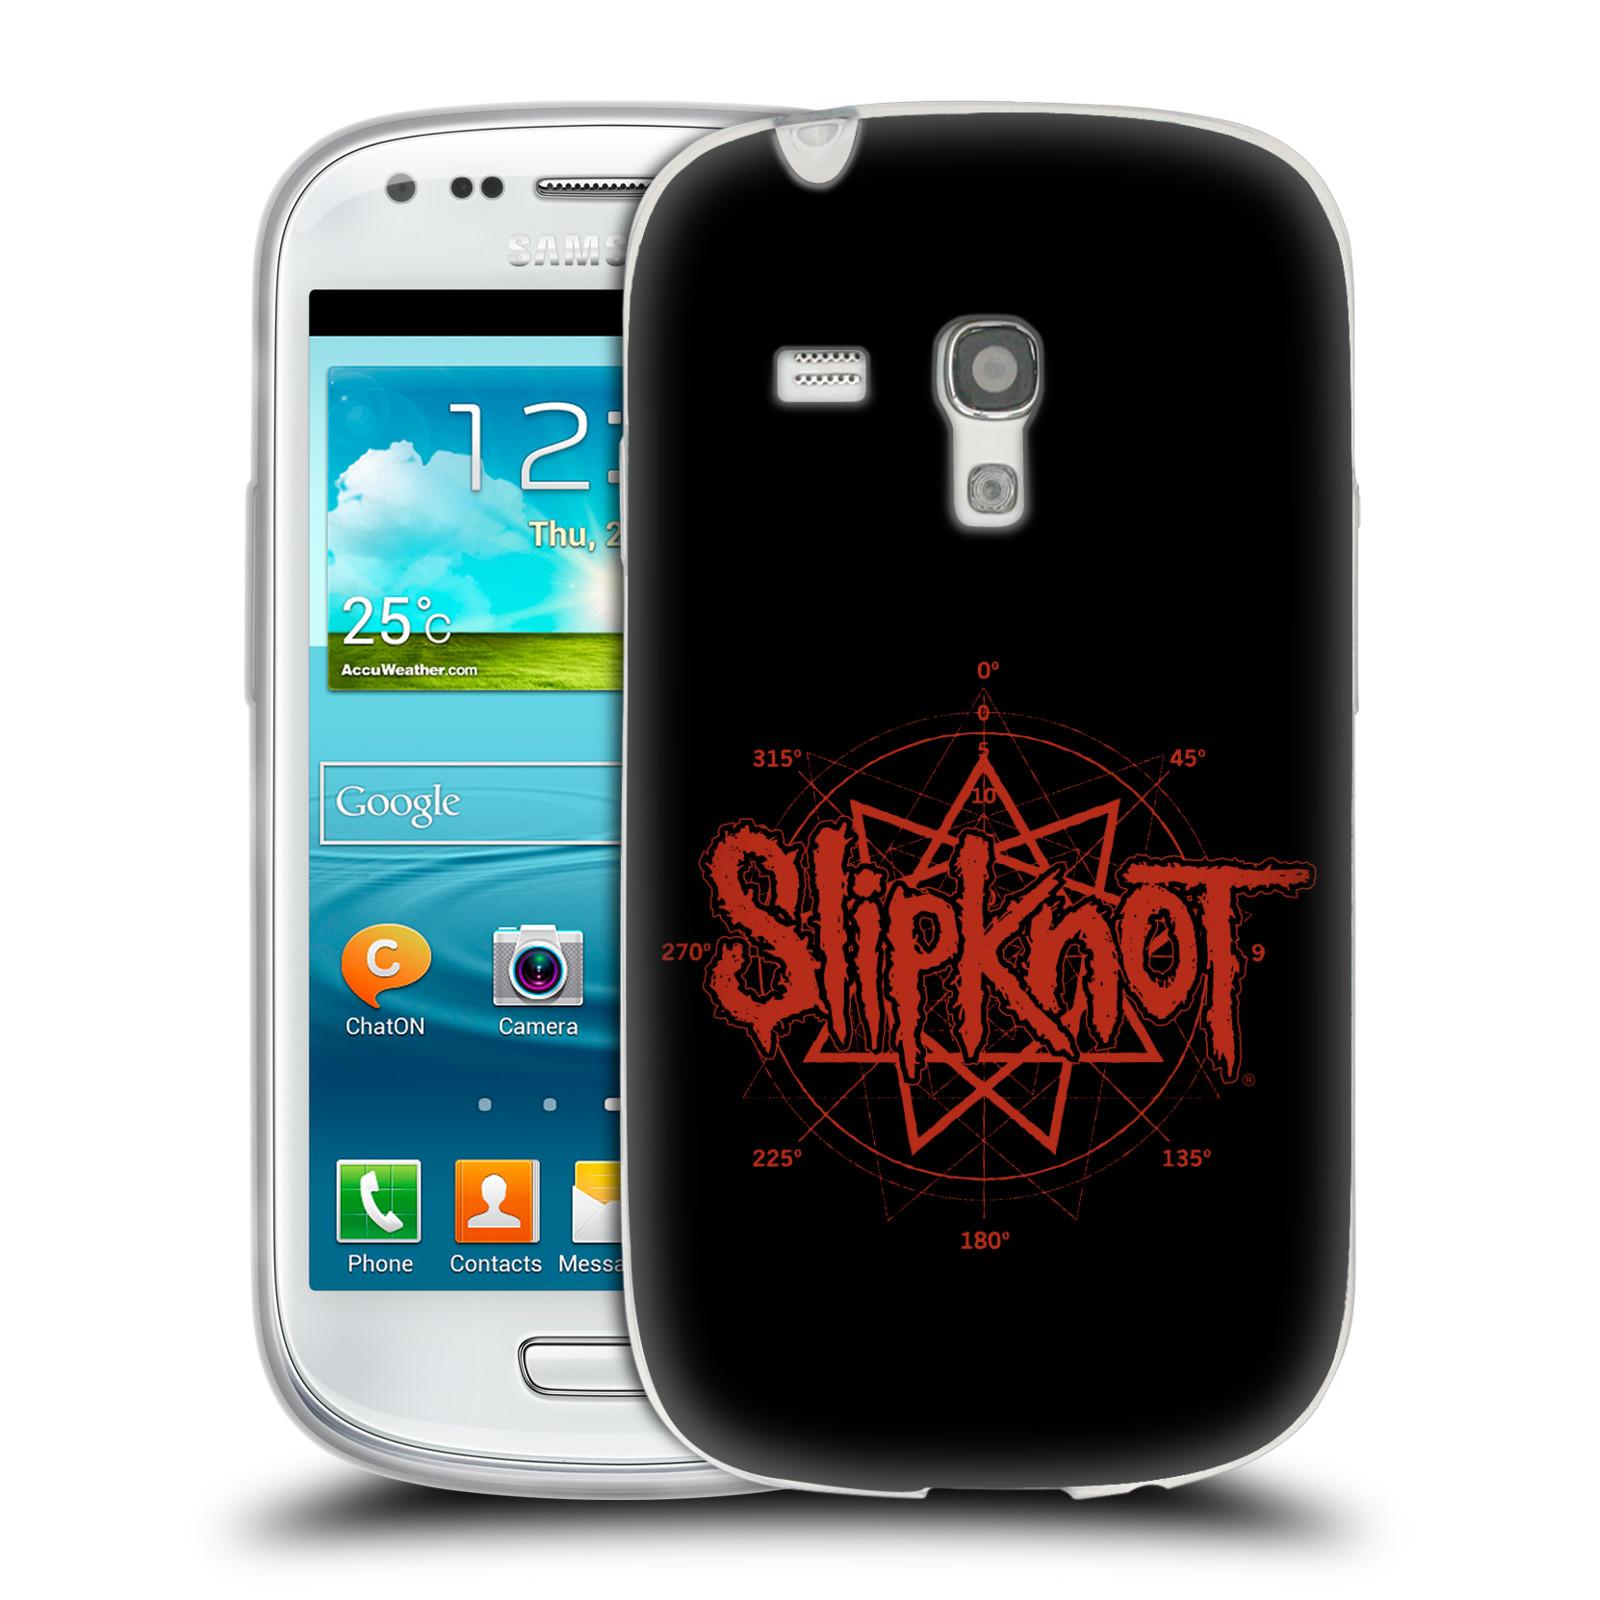 HEAD CASE silikonový obal na mobil Samsung Galaxy S3 MINI hudební skupina Slipknot logo